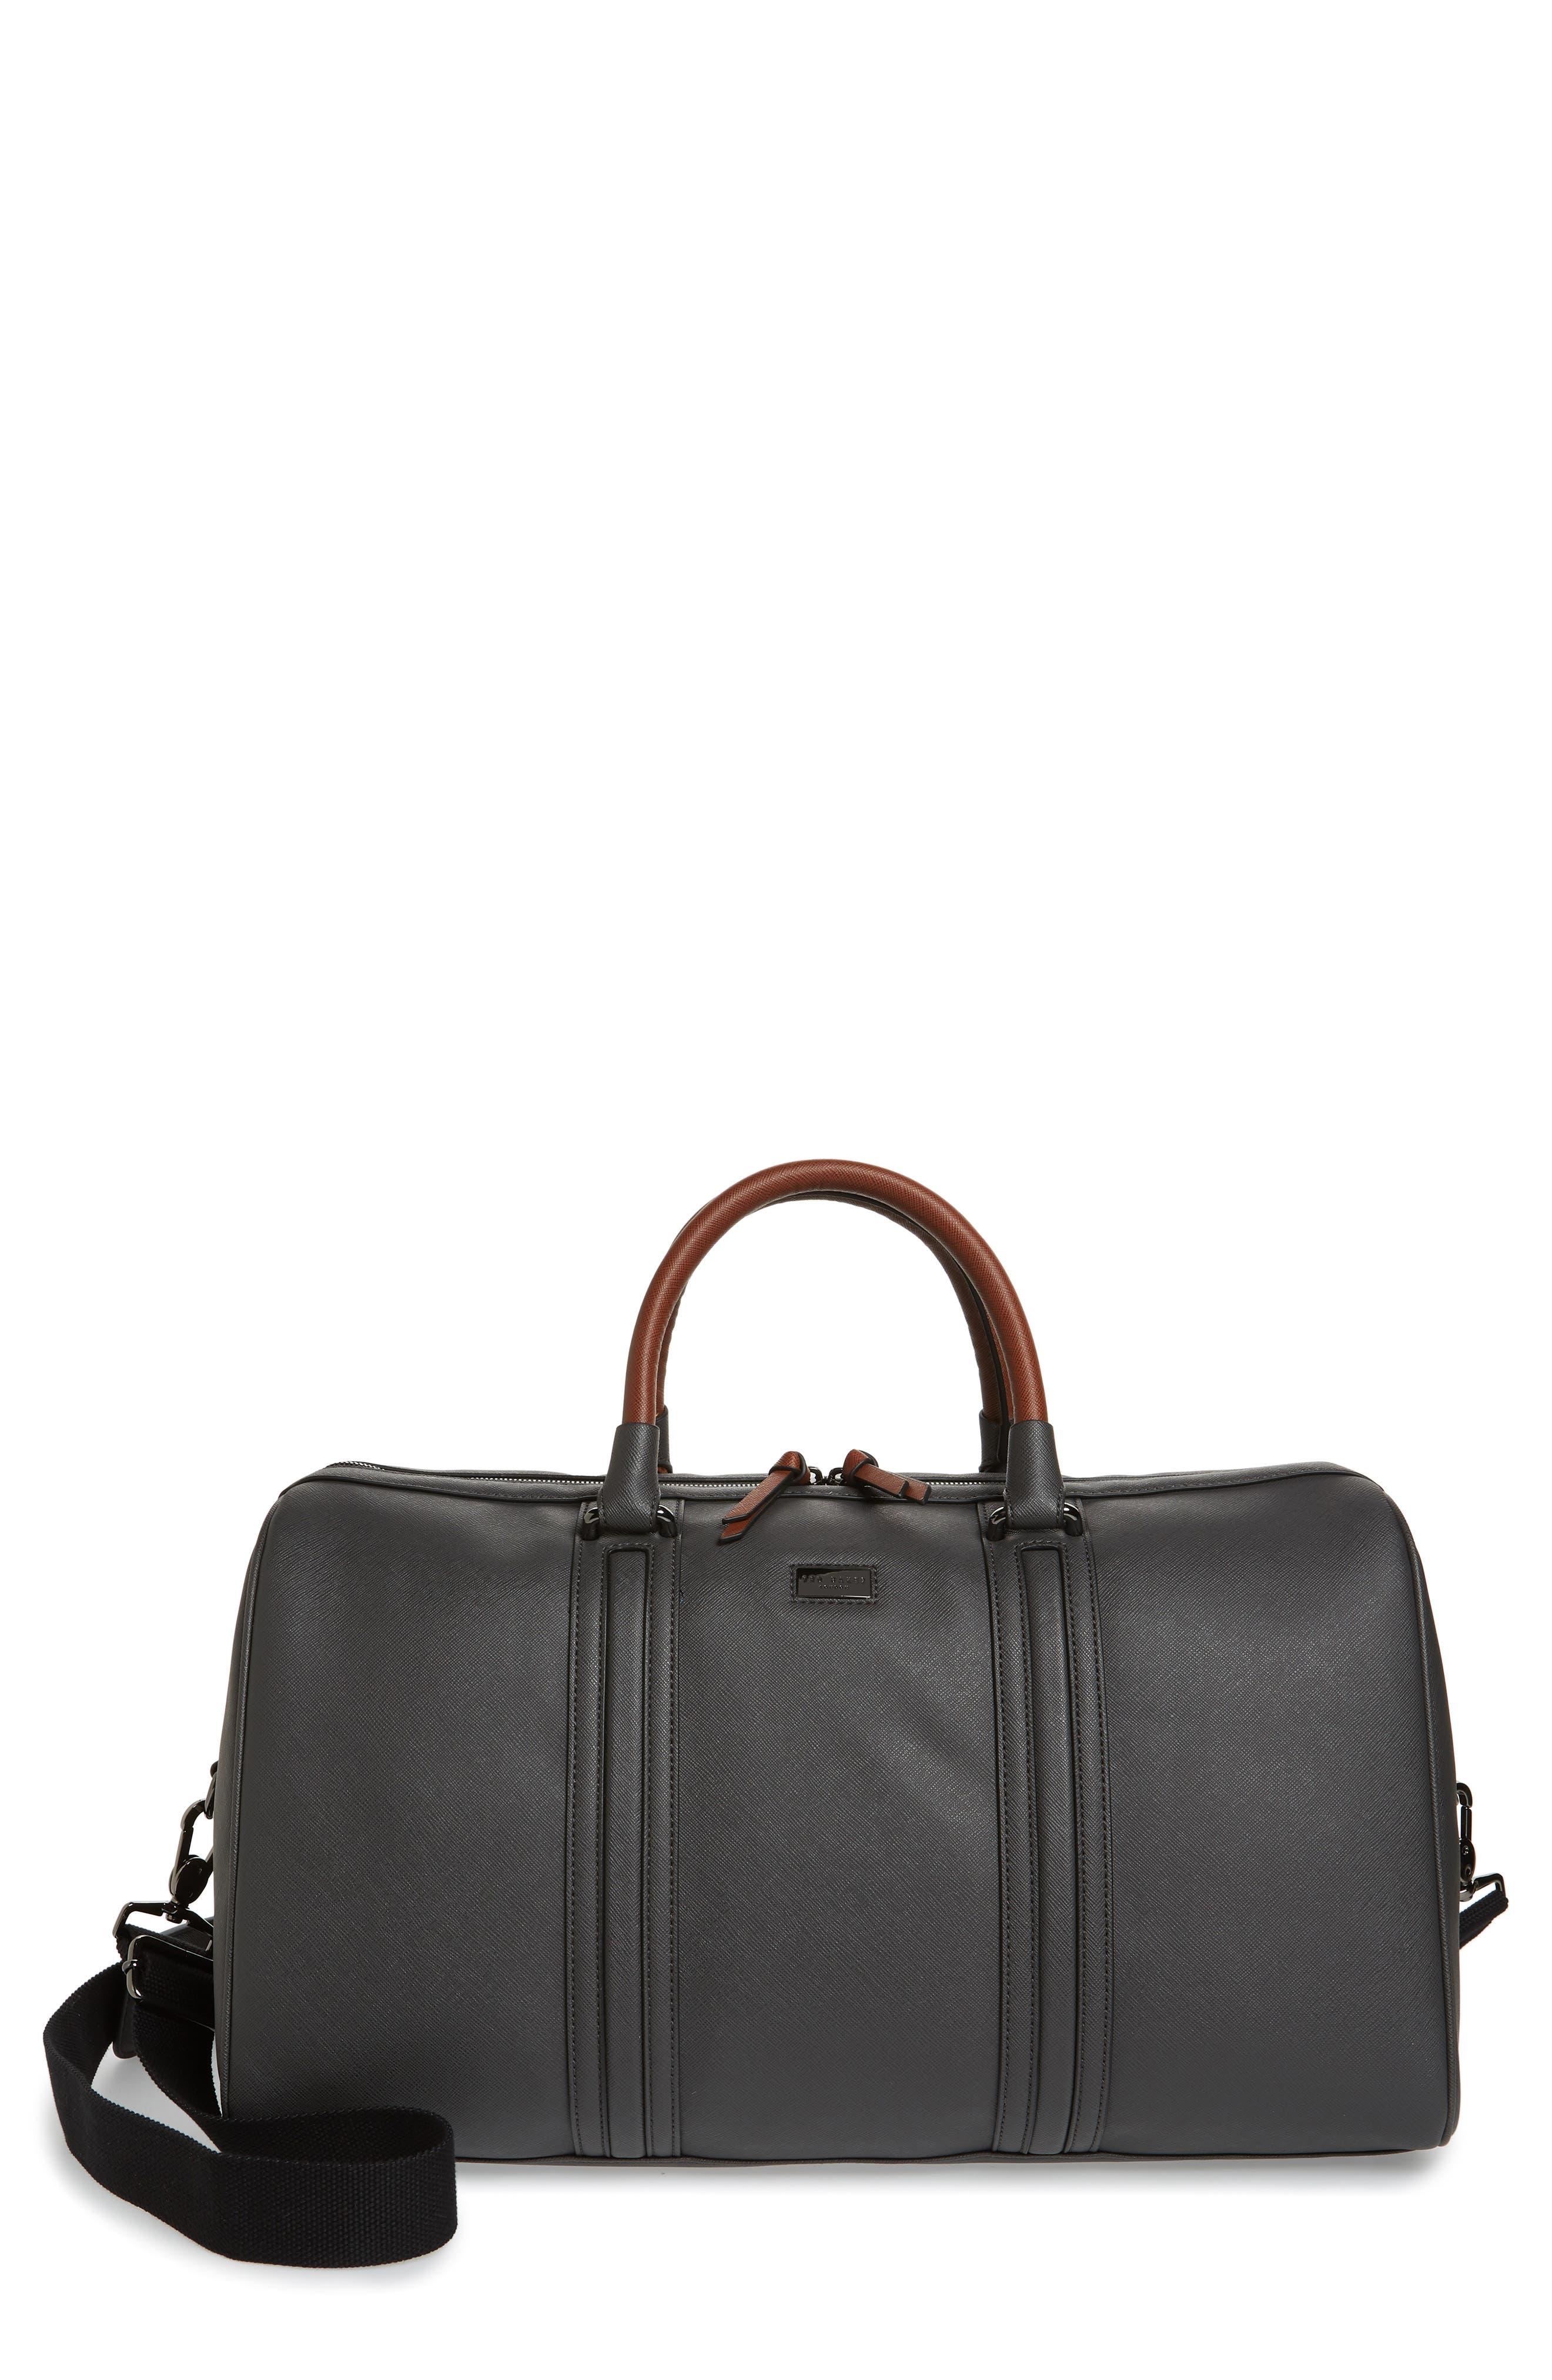 TED BAKER LONDON, Grankan Faux Leather Duffel Bag, Main thumbnail 1, color, 020